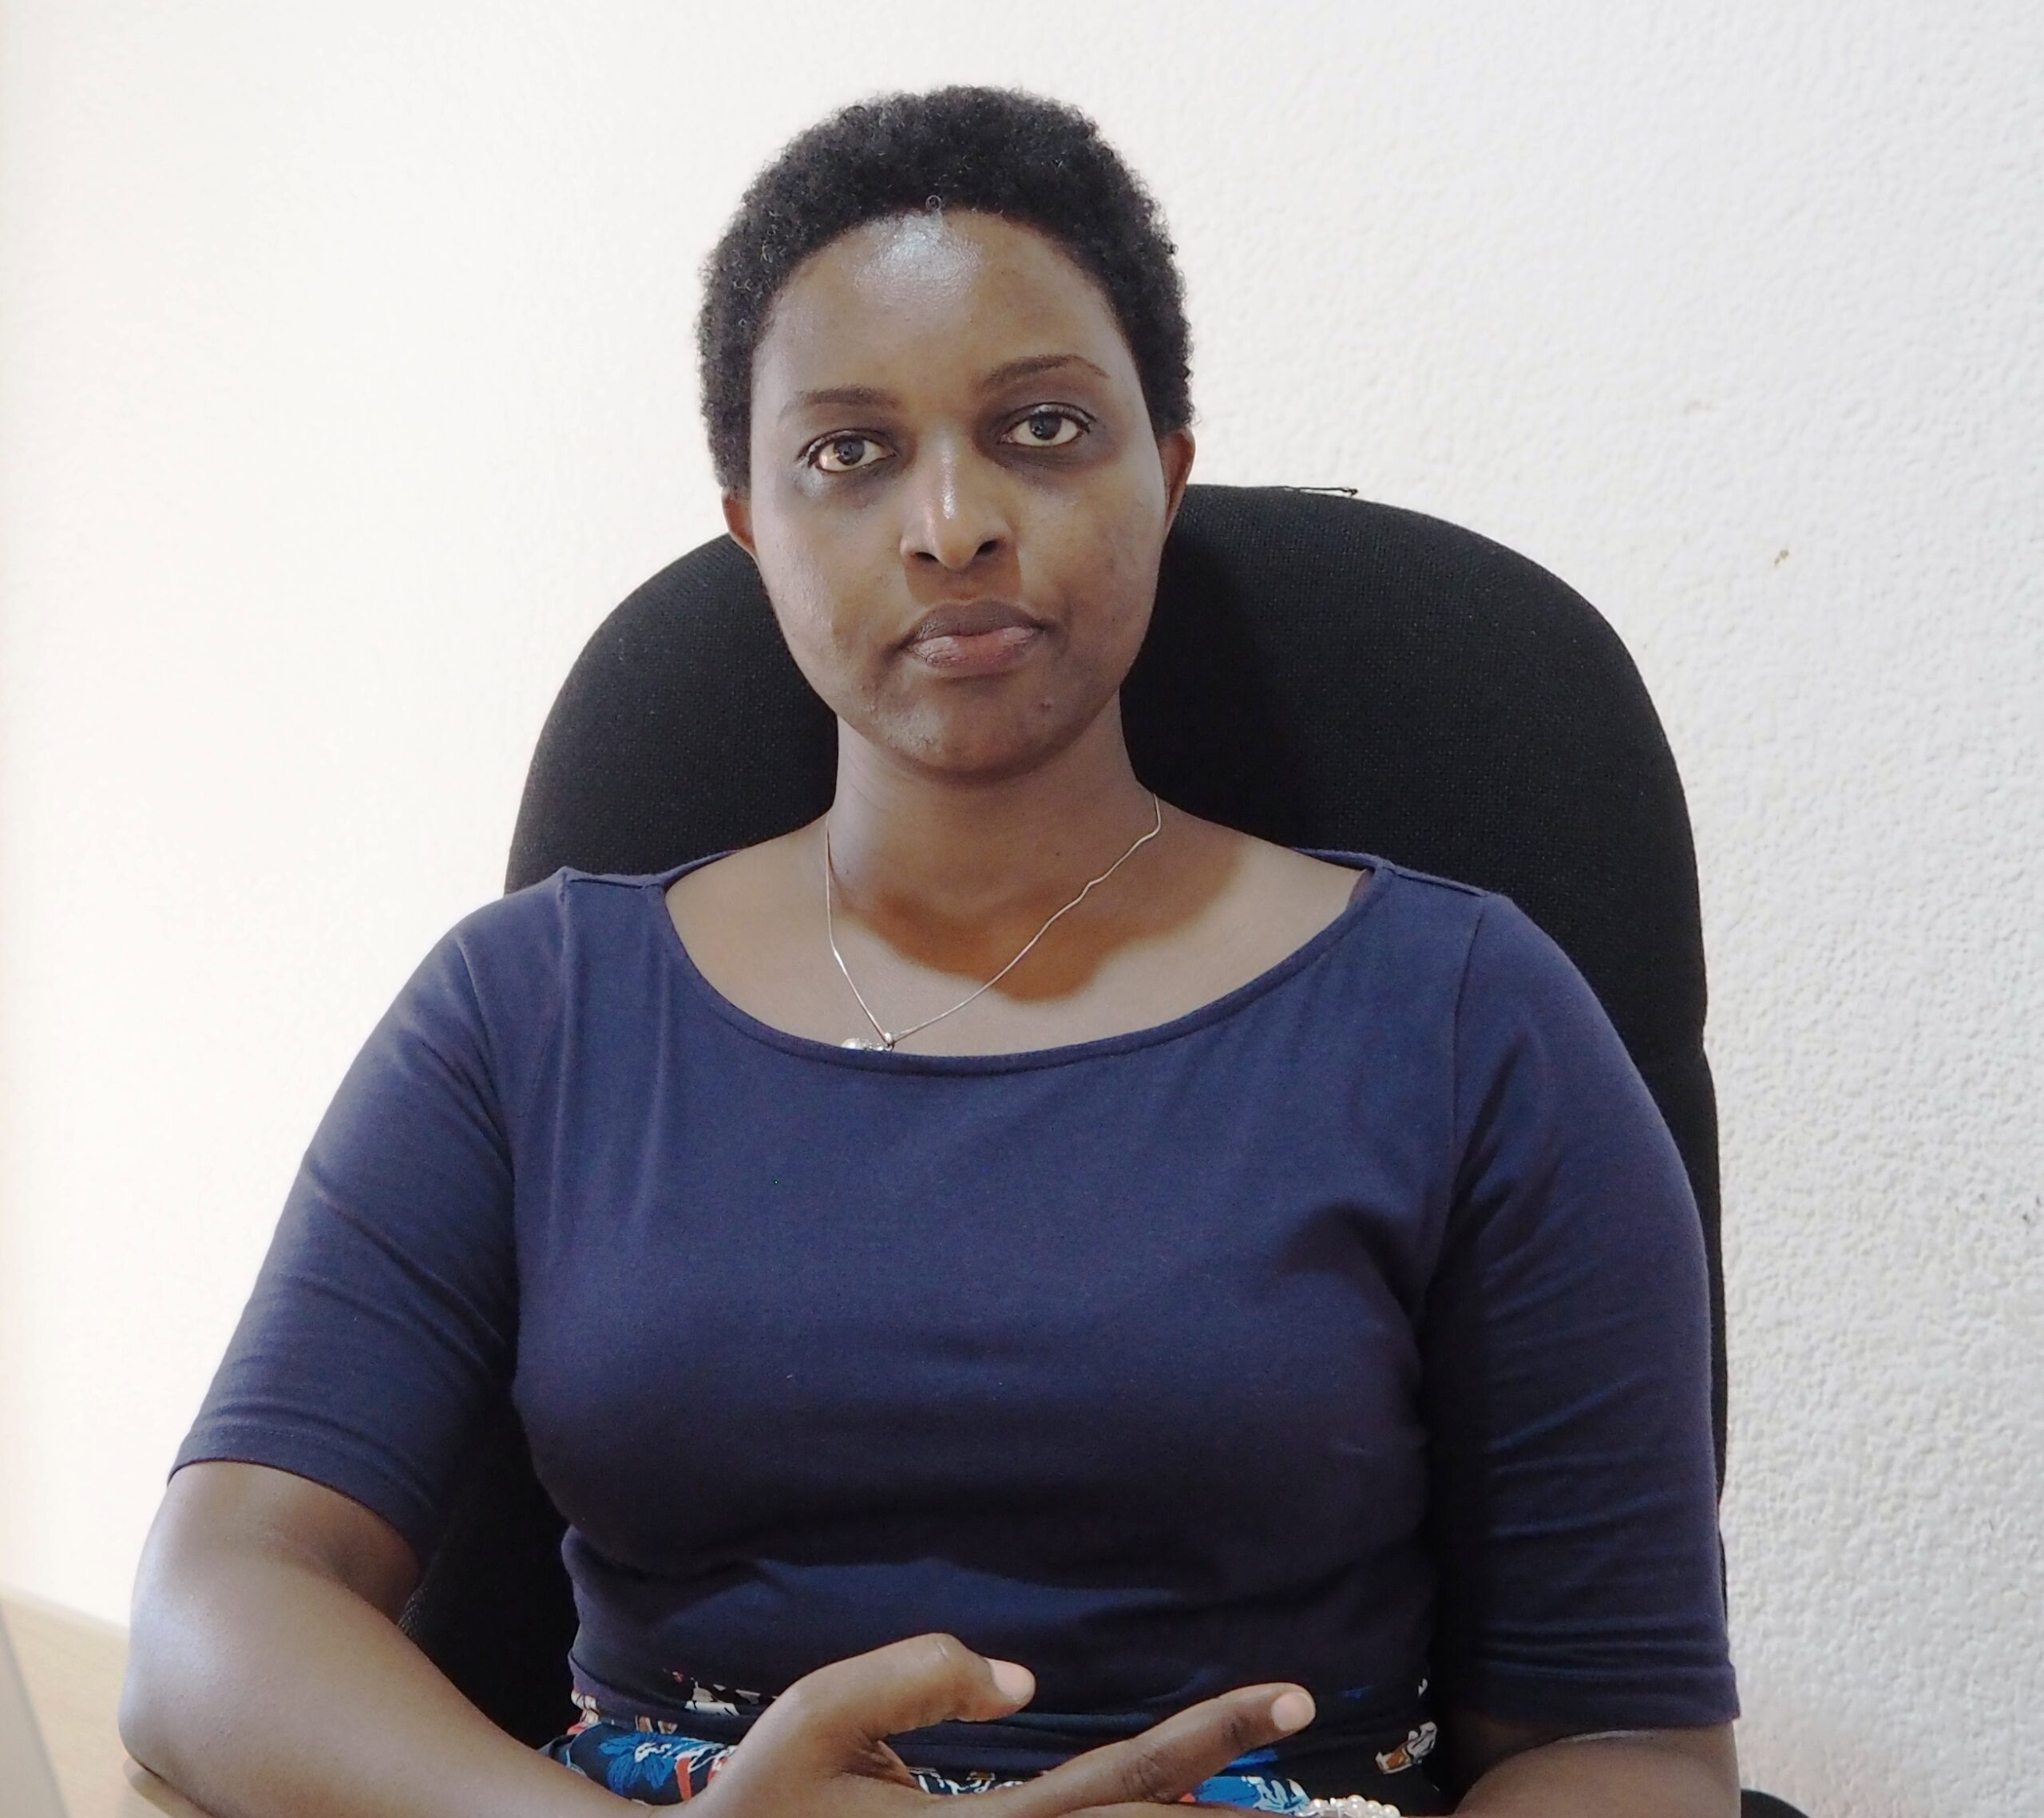 Chantal Ingabire